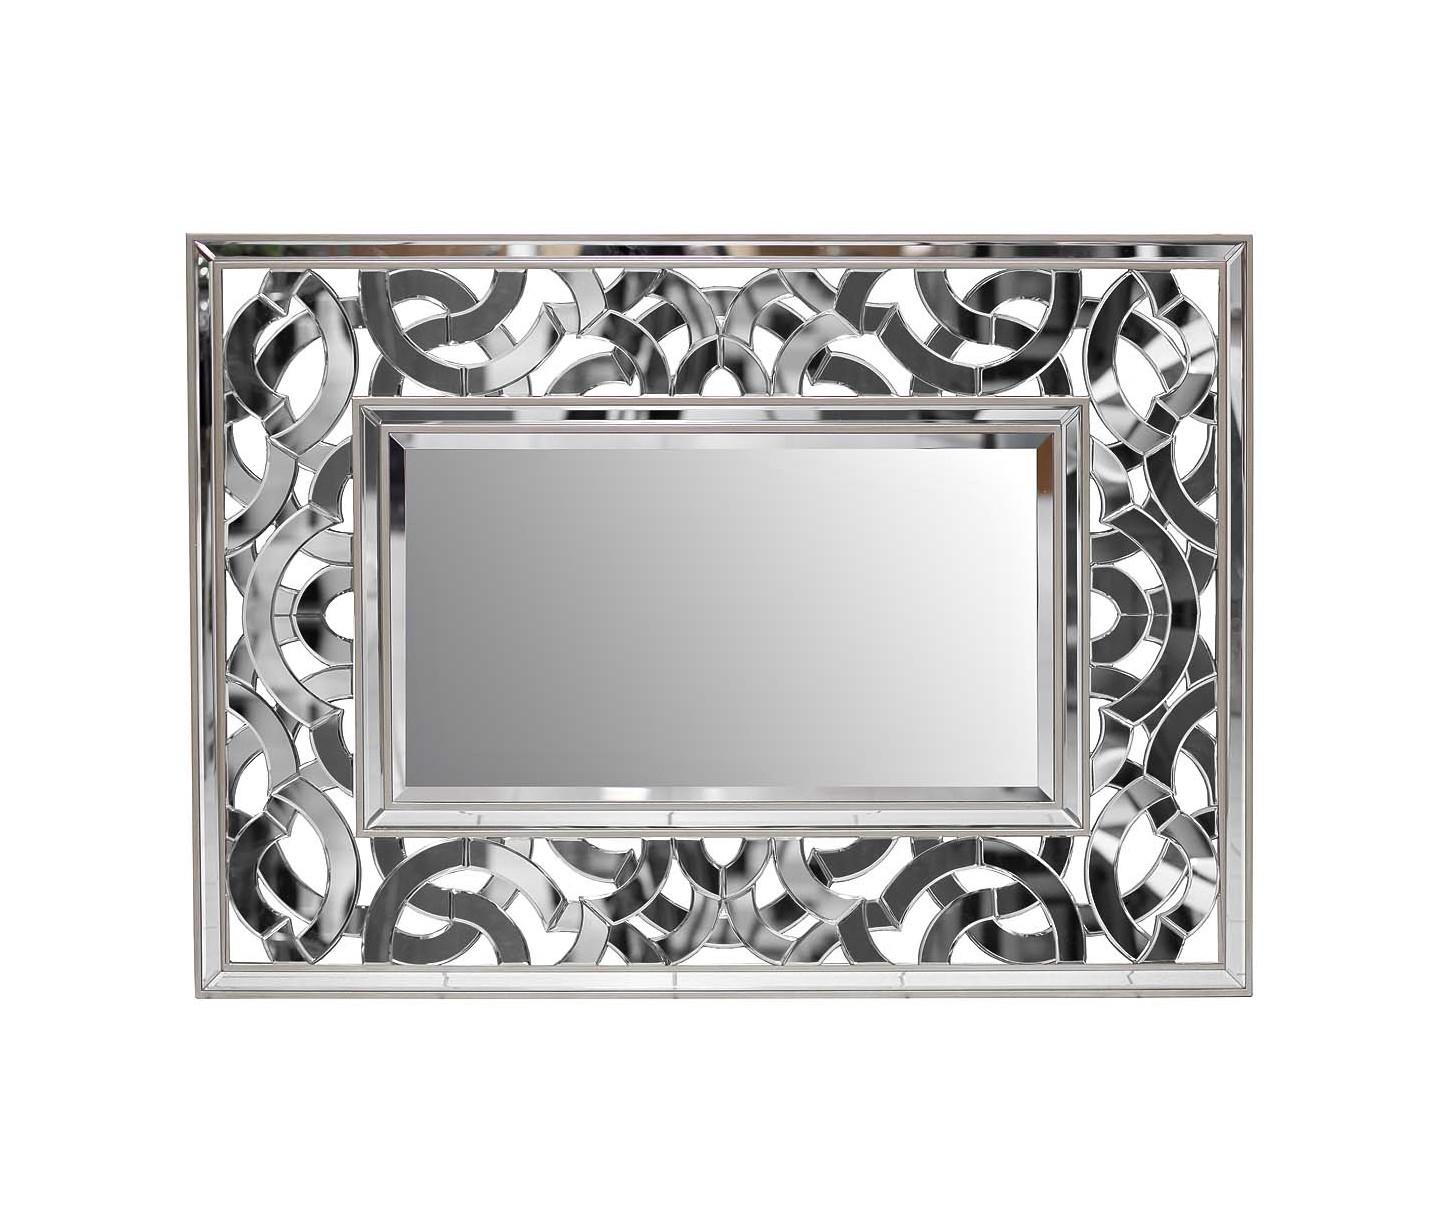 Зеркало декоративноеНастенные зеркала<br><br><br>Material: МДФ<br>Ширина см: 138<br>Высота см: 100<br>Глубина см: 2